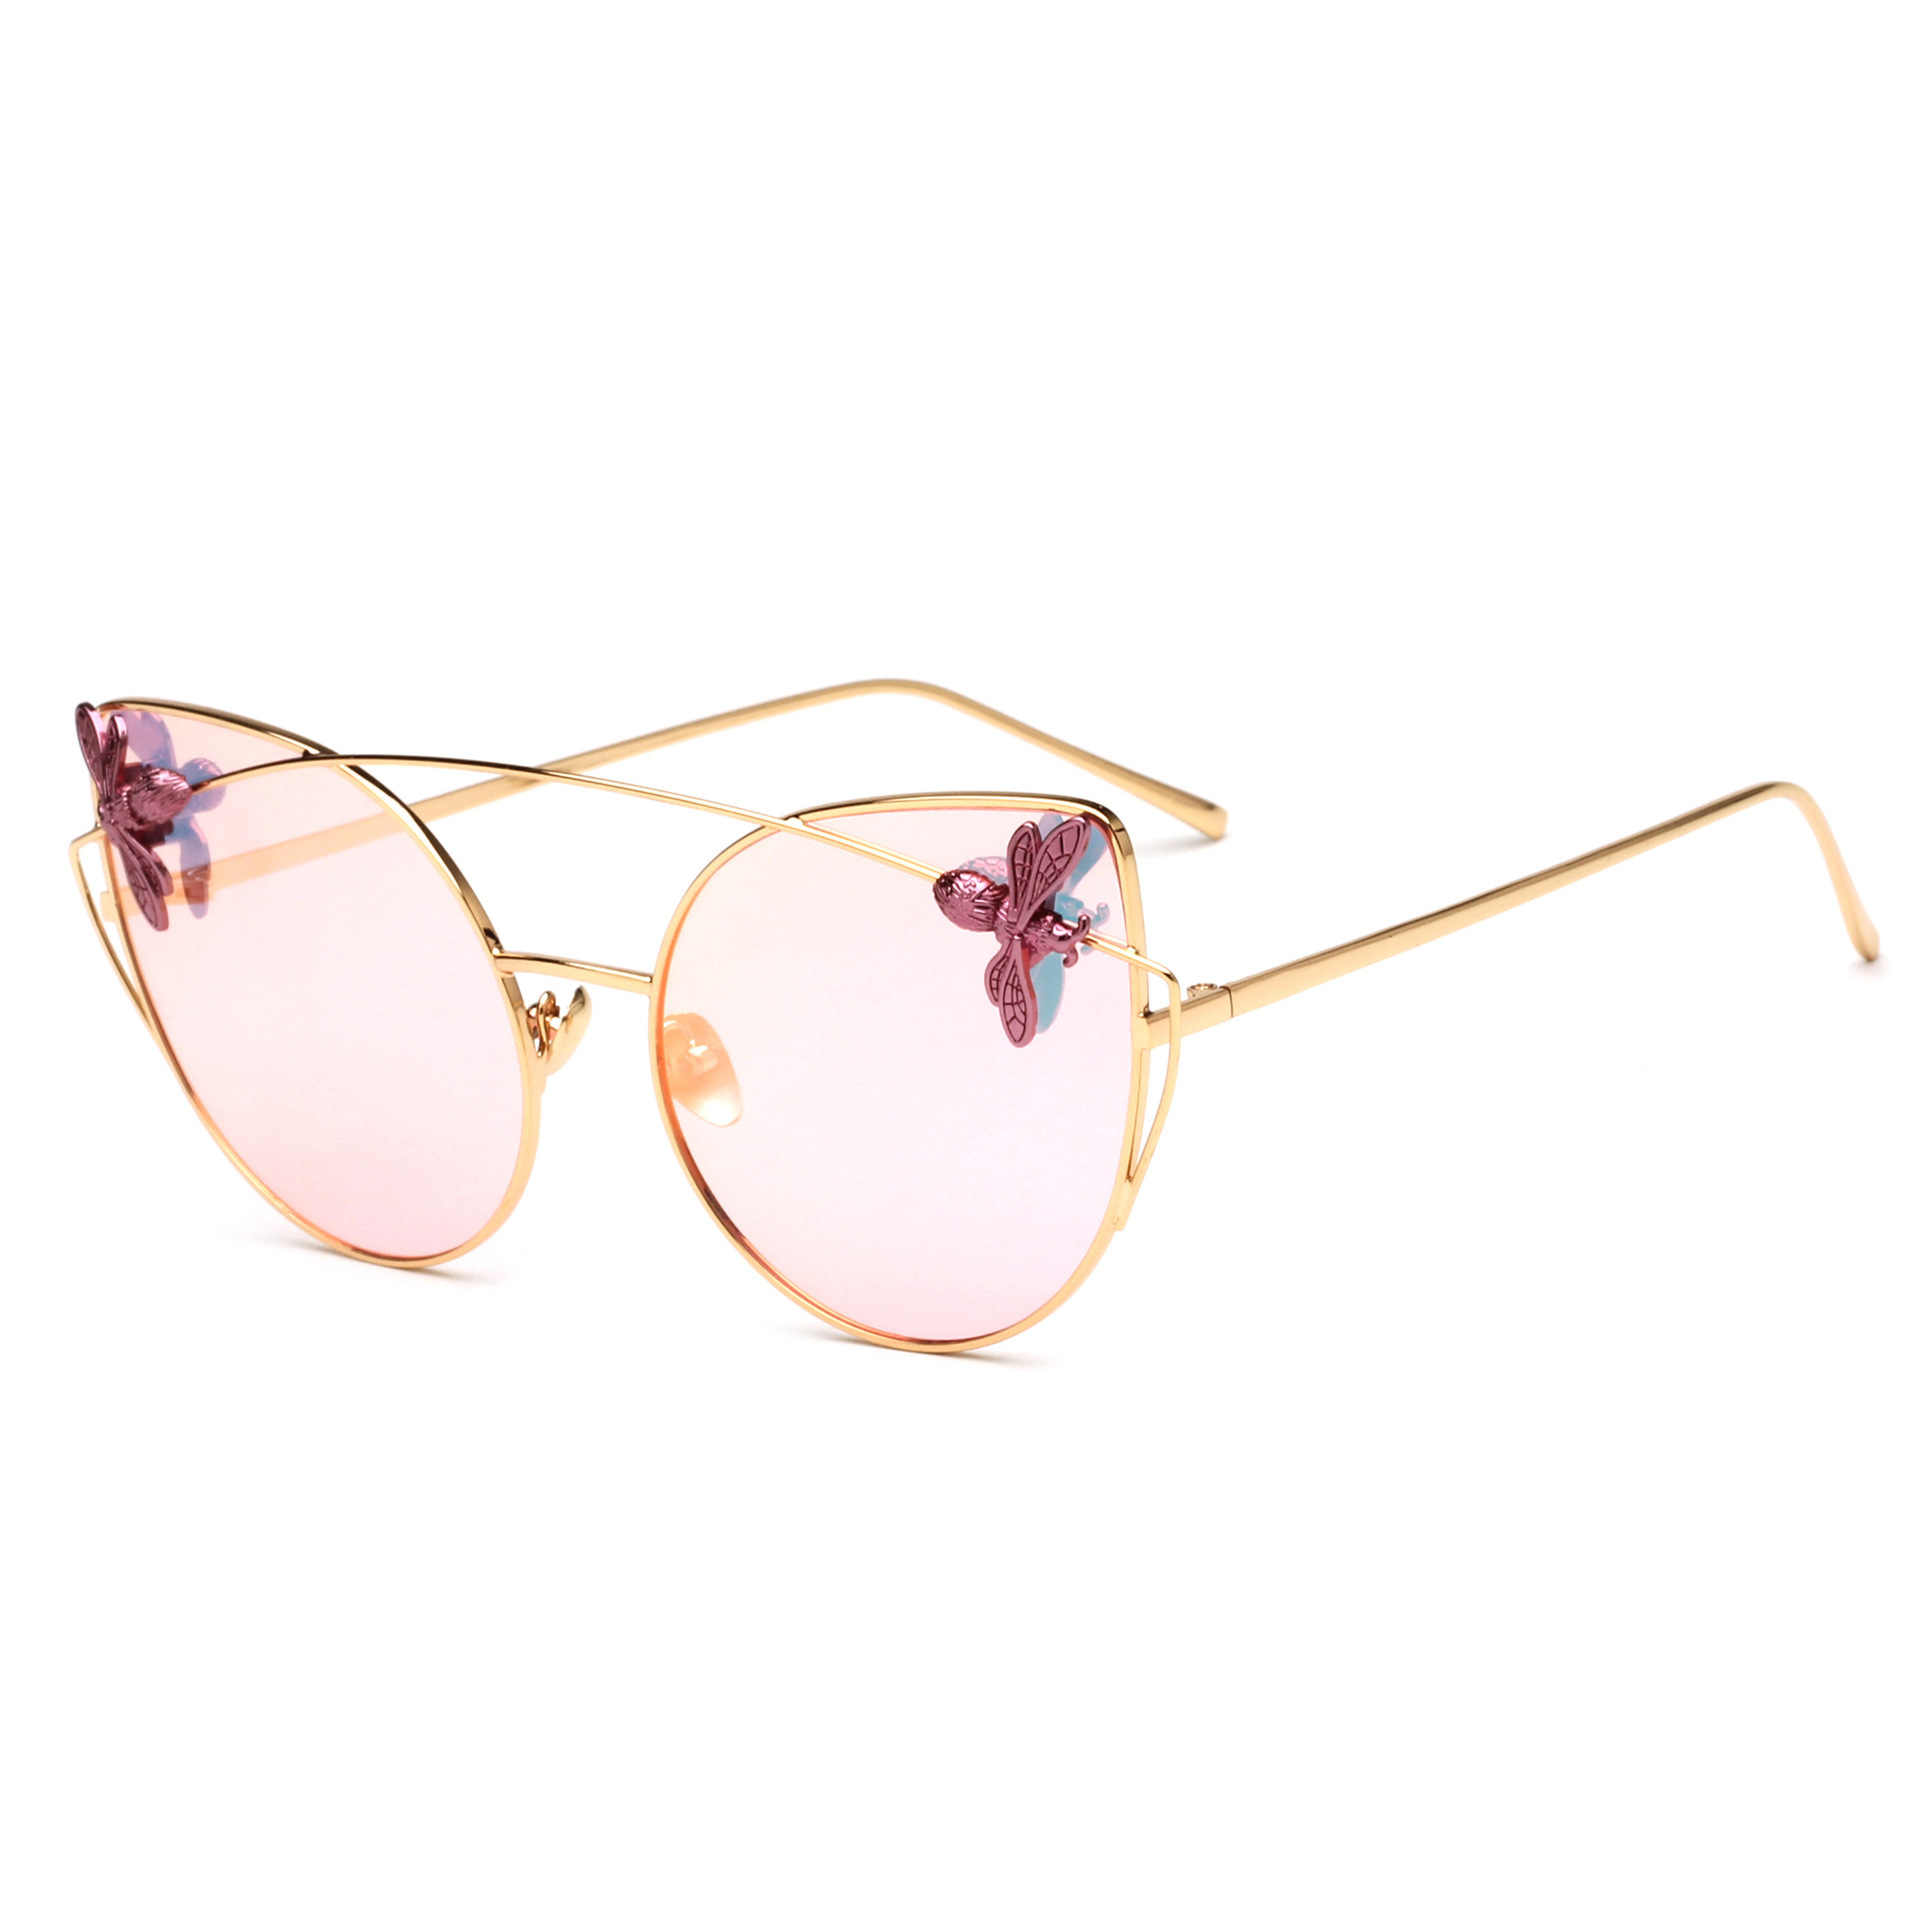 Carving Bees Sunglasses Women Cat Eye Hollow Metal Frame Sun Glasses Vintage Gothic Glasses Oculos Feminino Lentes Gafas De Sol